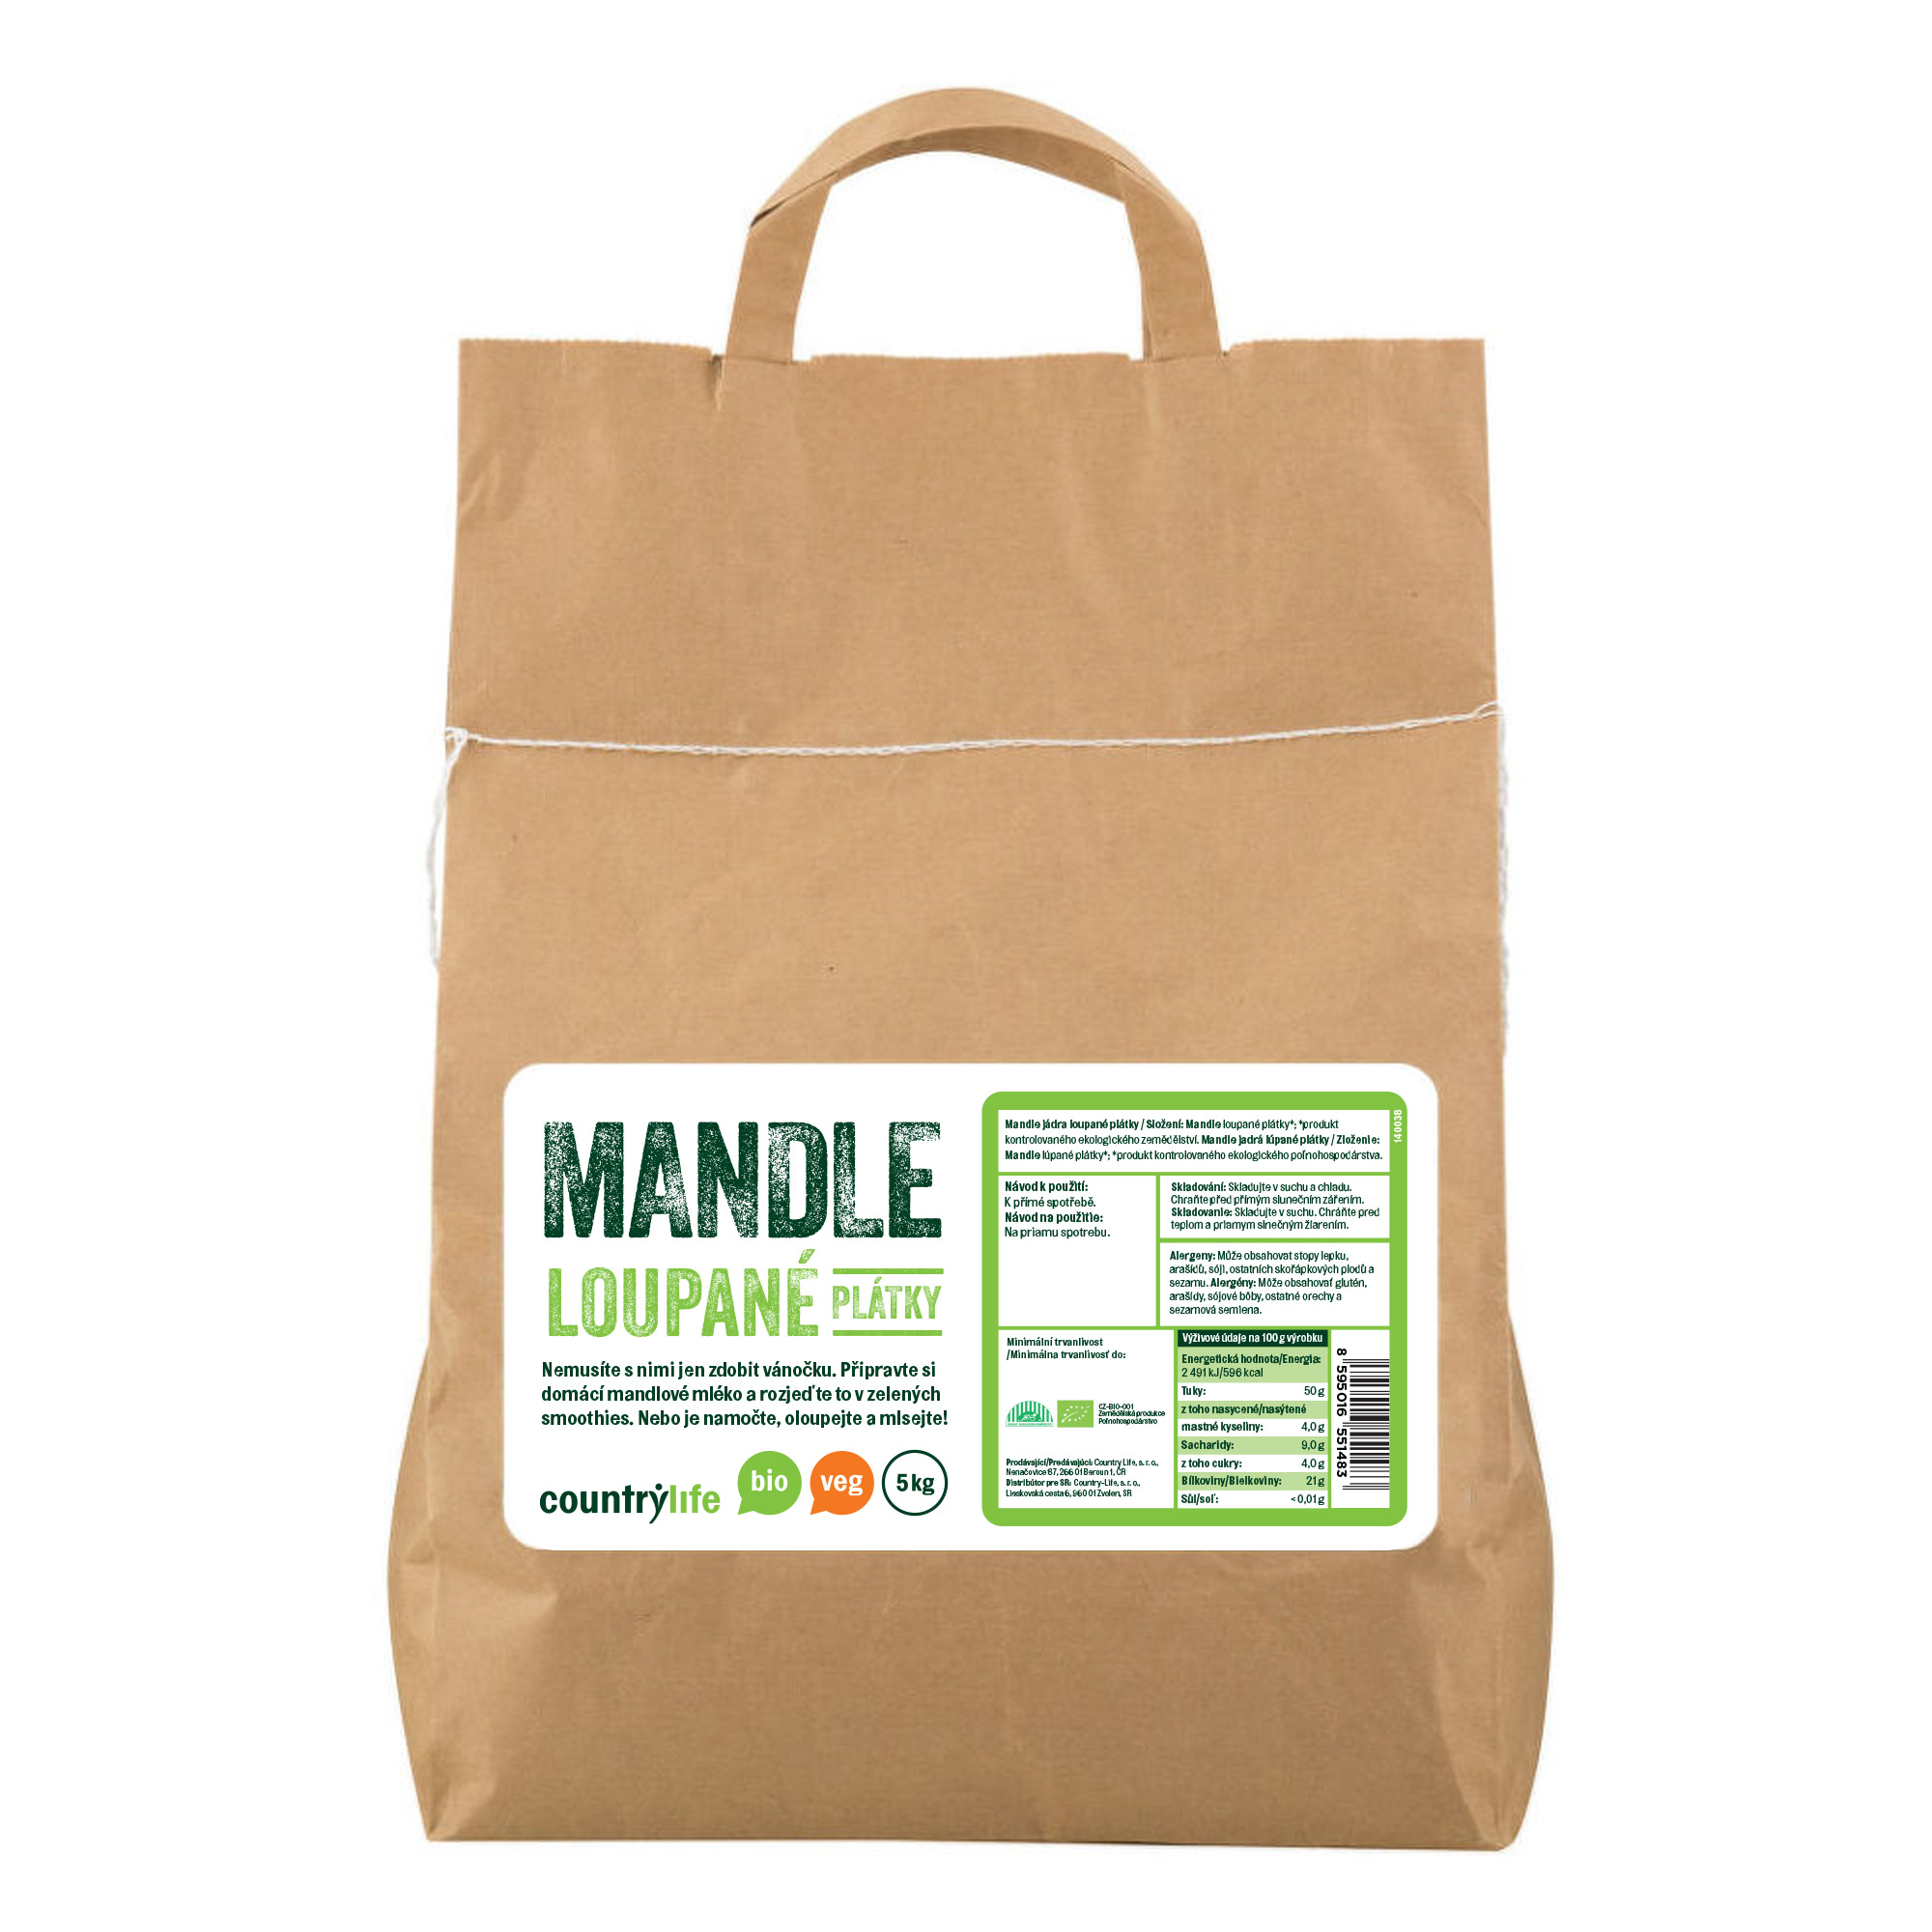 Mandle loupané plátky 5kg BIO   COUNTRYLIFE